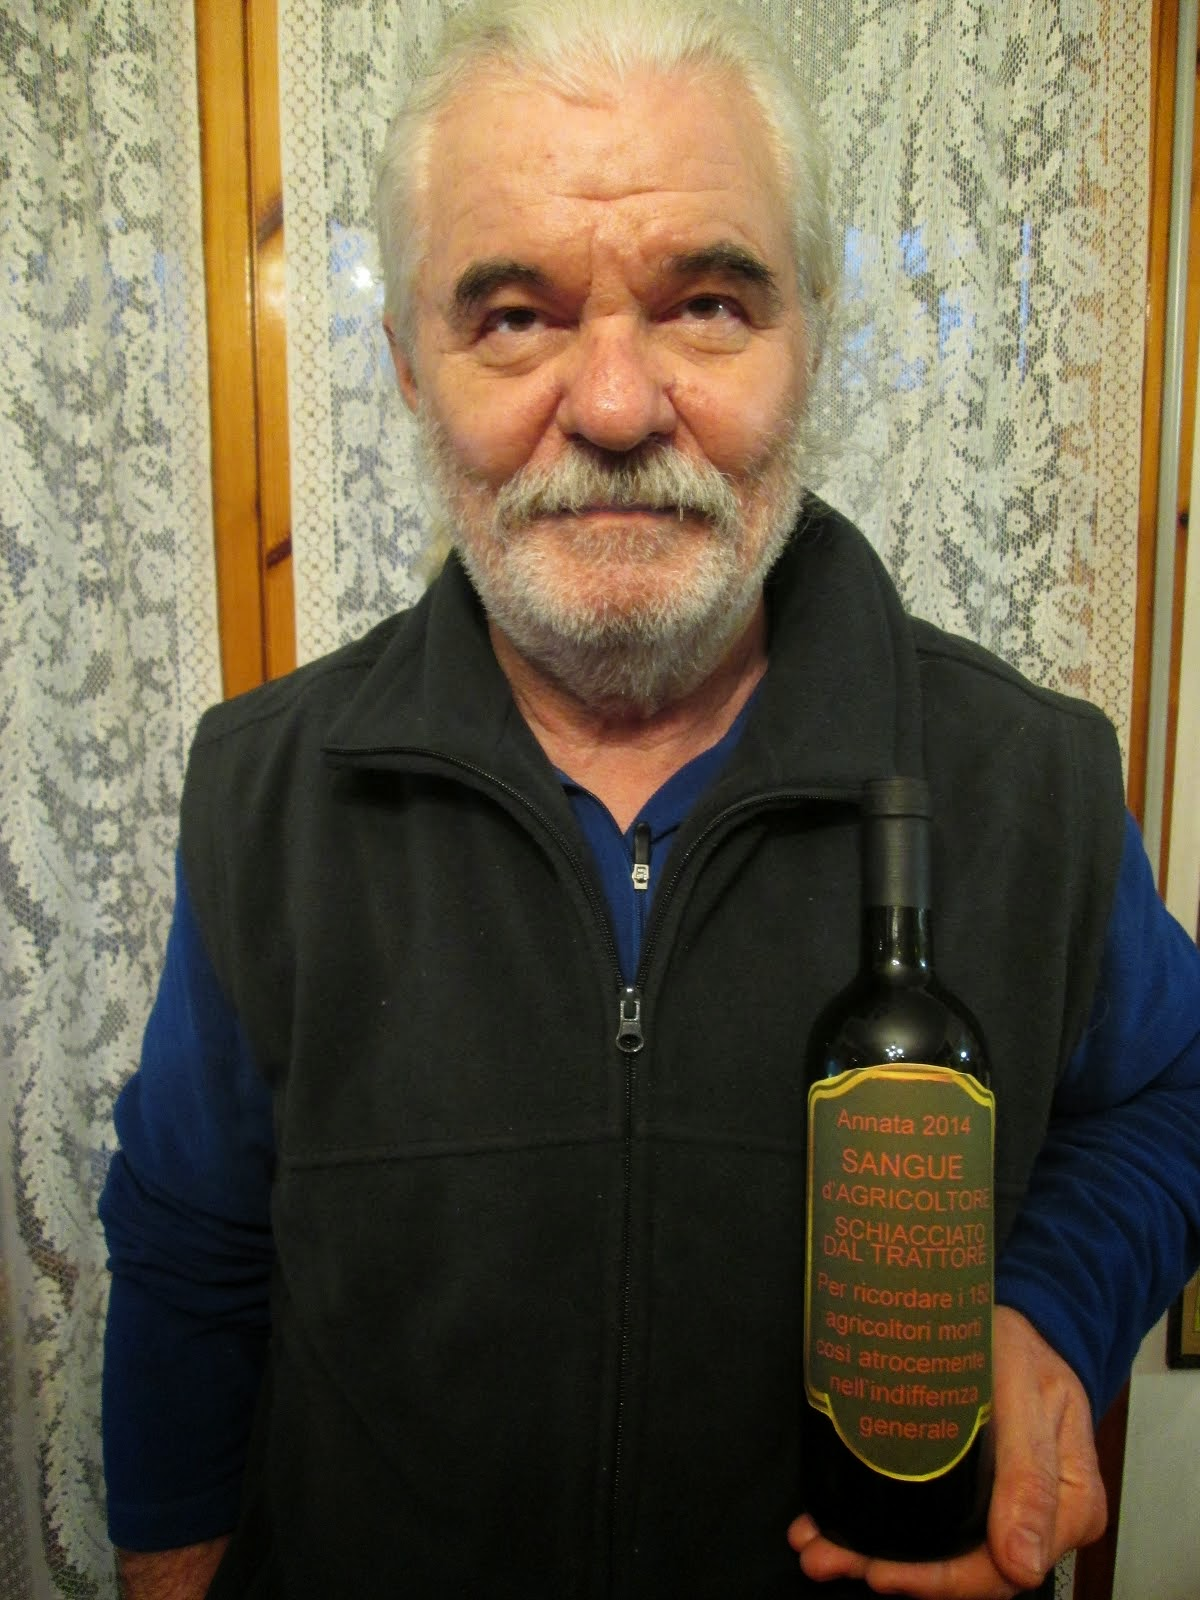 Bottiglie sangue d'agricoltore